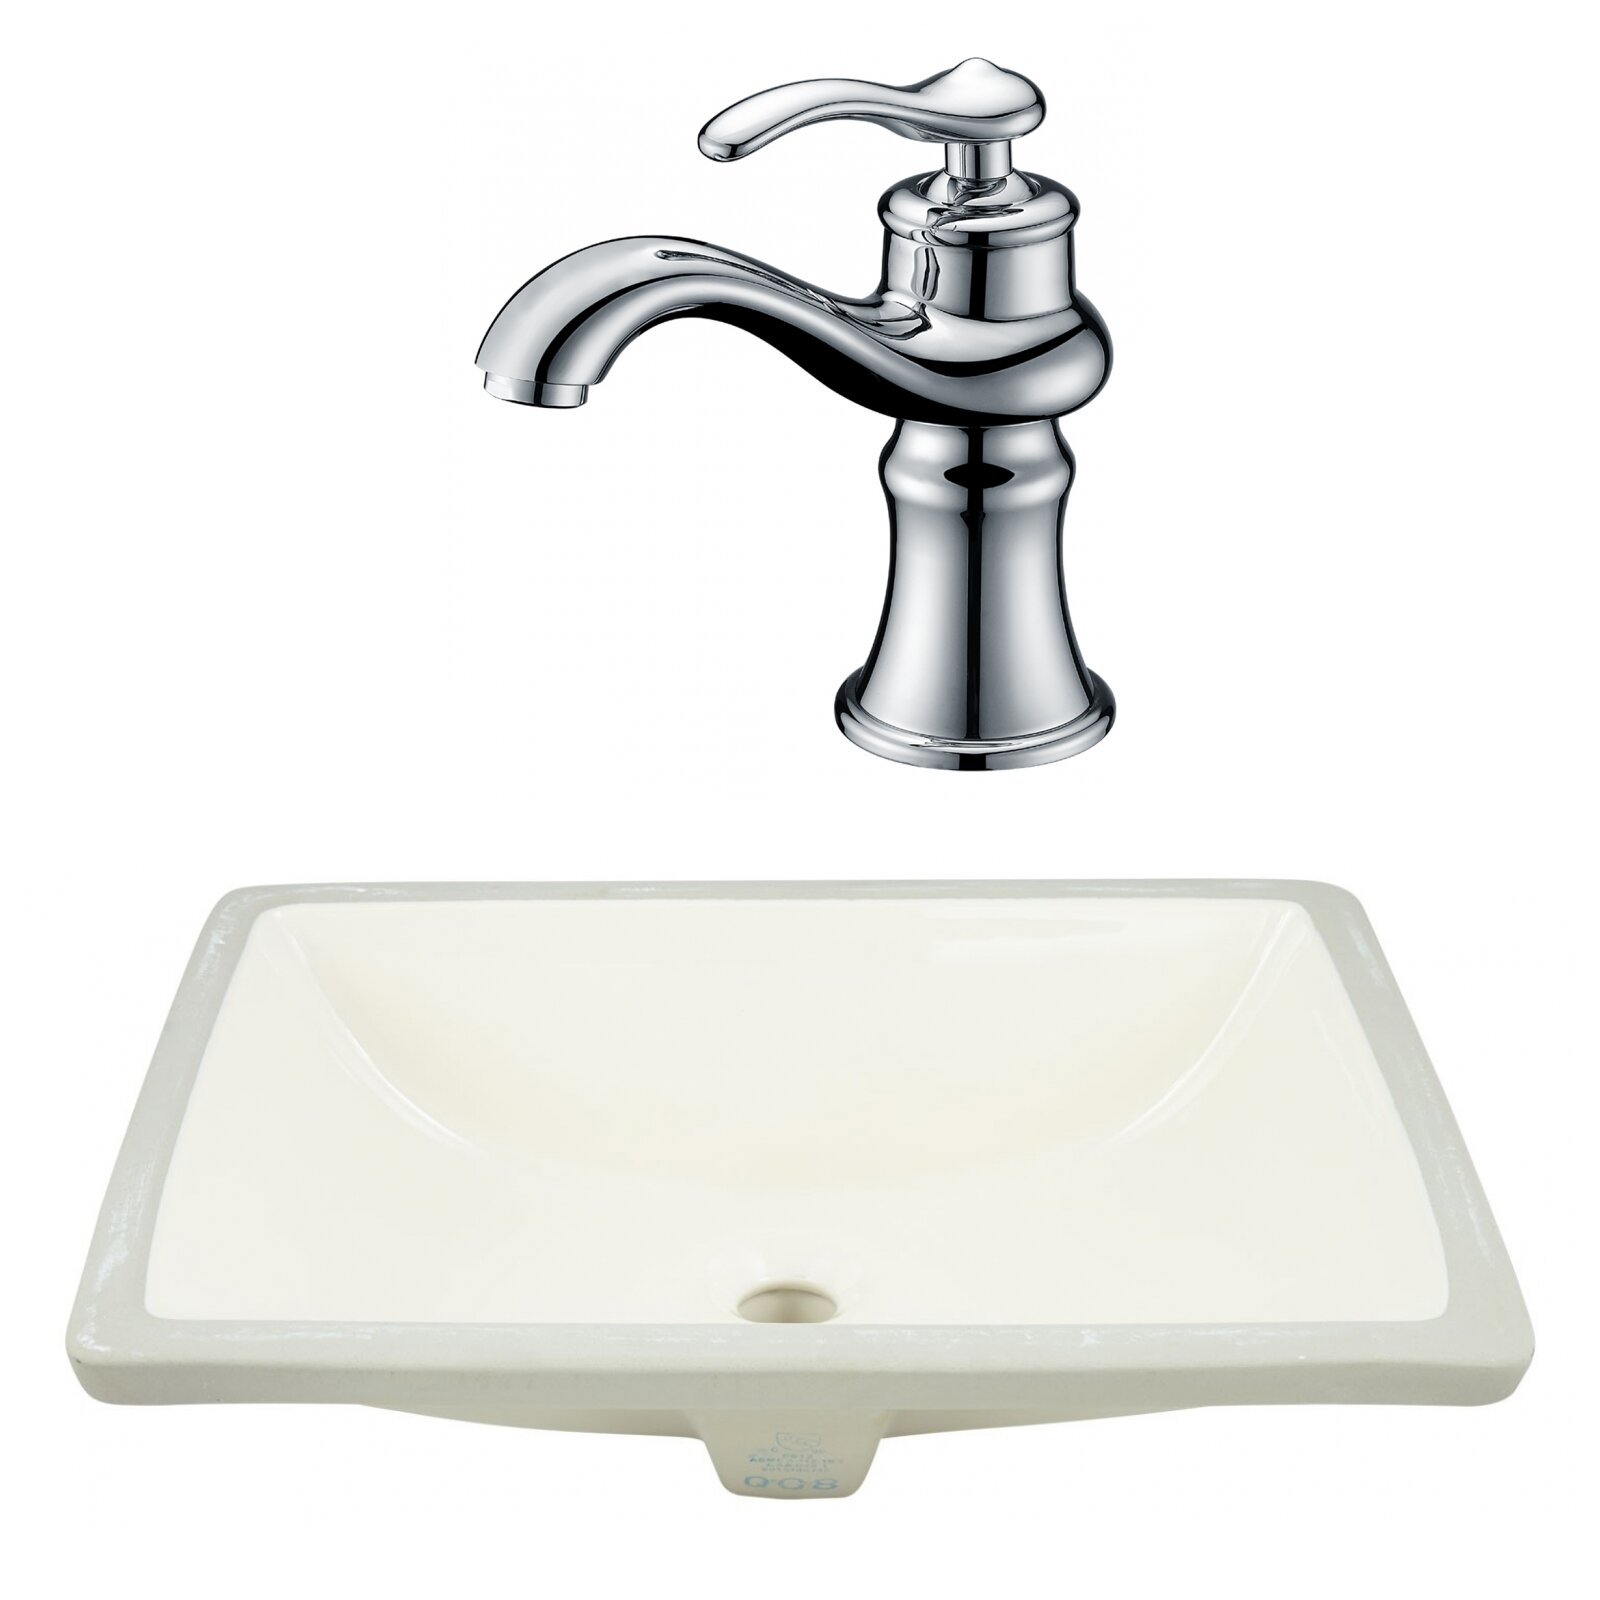 Royalpurplebathkitchen Csa Ceramic Rectangular Undermount Bathroom Sink With Faucet And Overflow Wayfair Ca